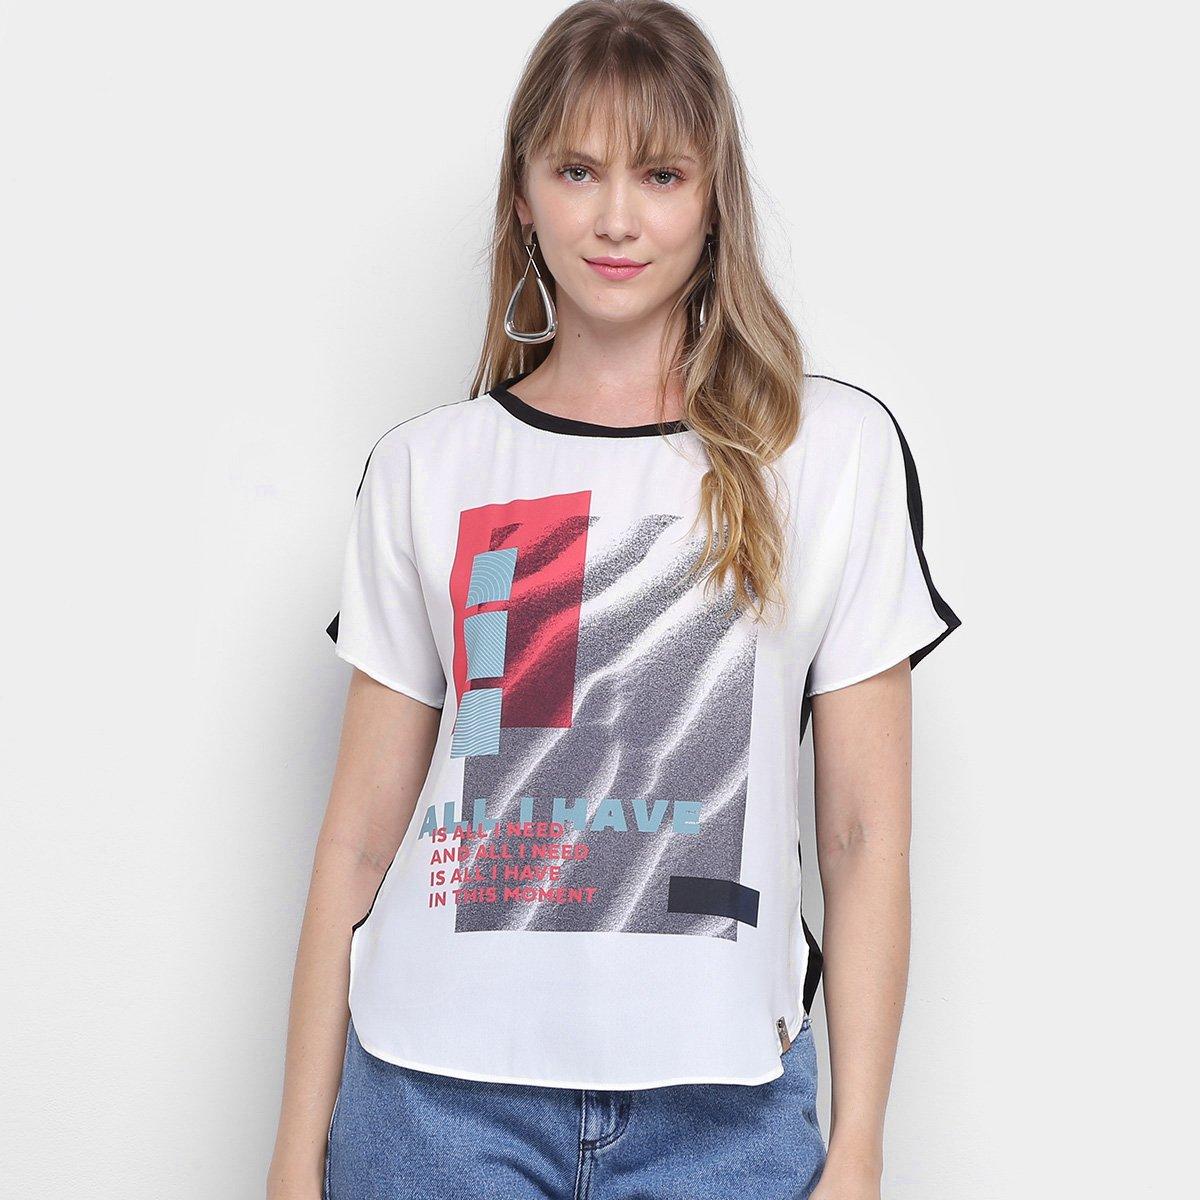 Camiseta Morena Rosa Abertura Lateral Enjoy Growing Feminina